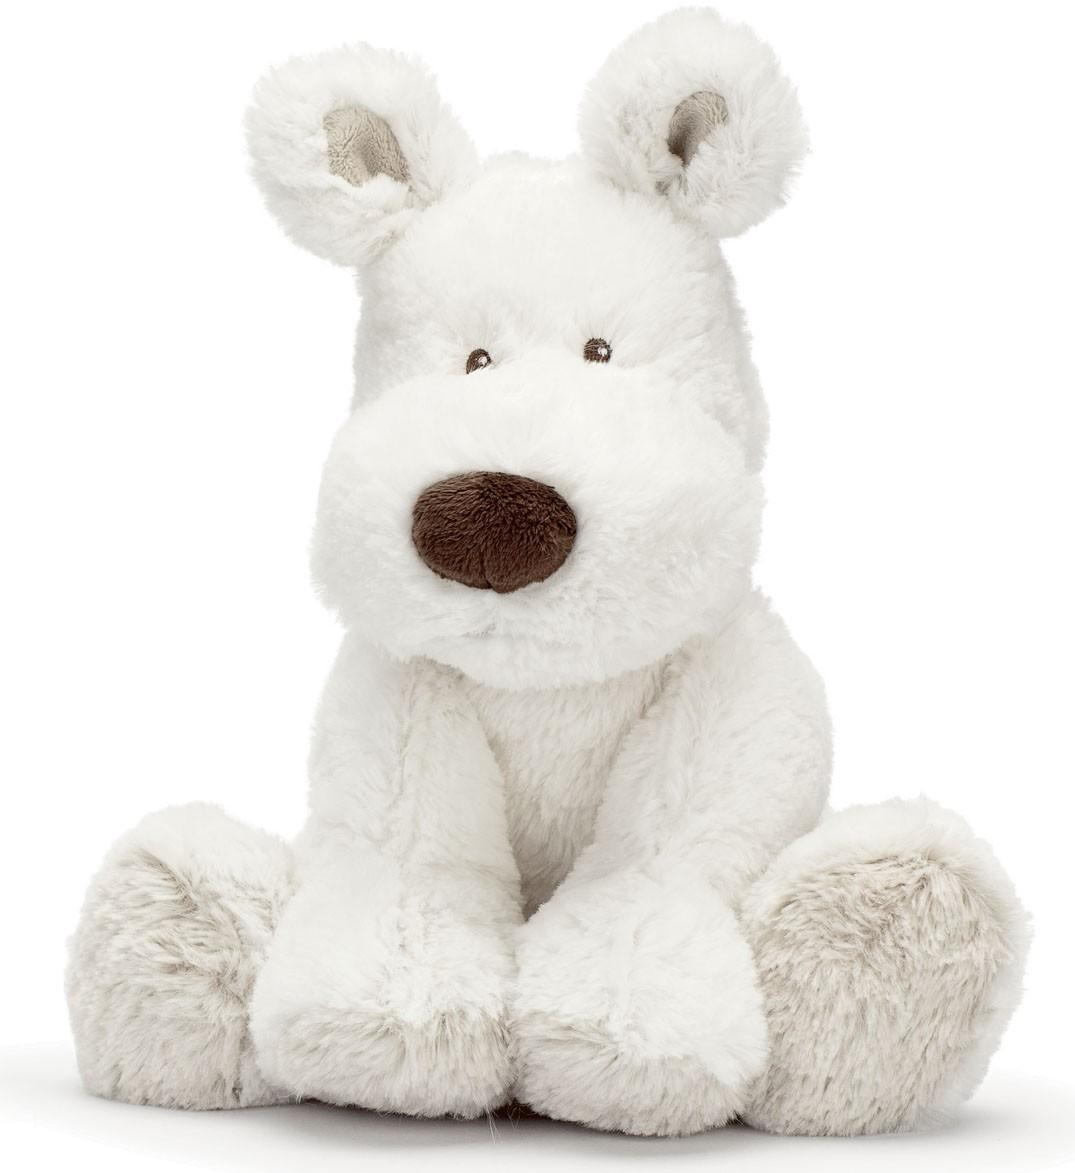 Hund Teddy Cream, 21cm - Teddykompaniet